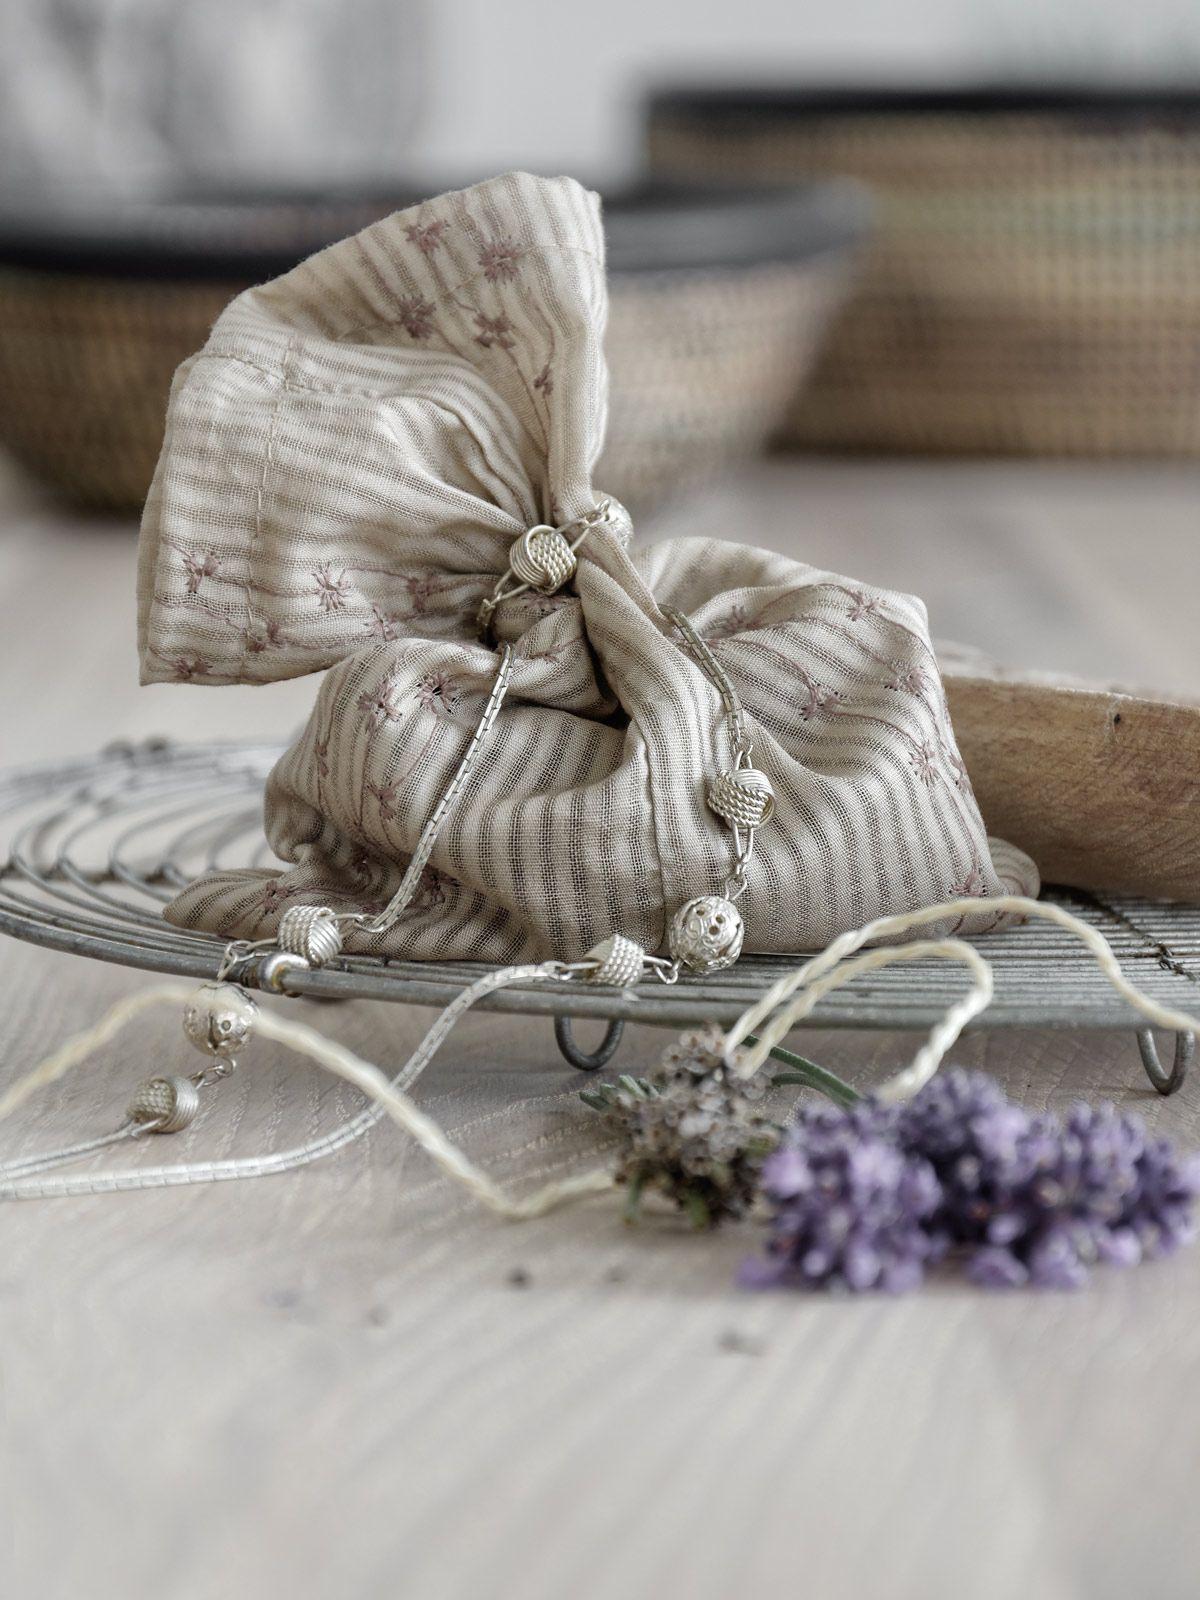 Diy Mx Living Diy Pinterest Nähen Lavendel Und Säckchen